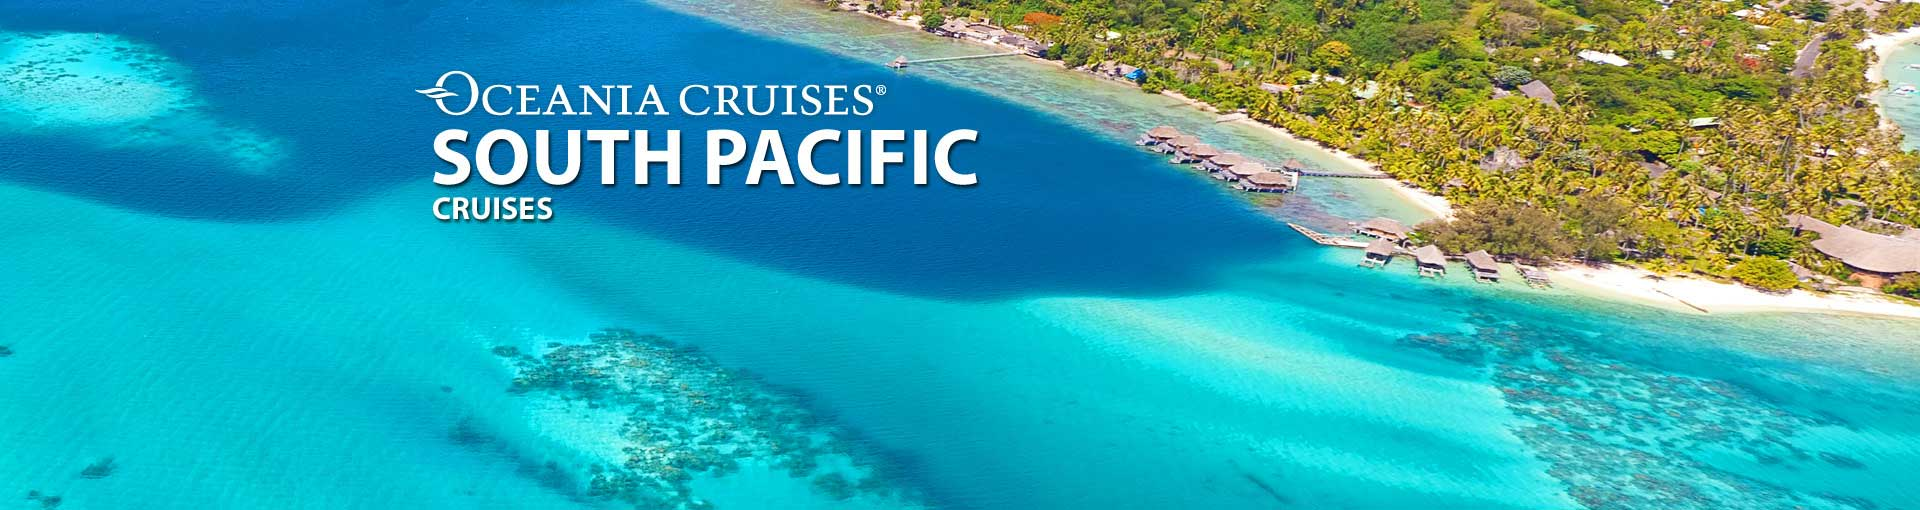 Oceania Cruises South Pacific Tahiti Cruises